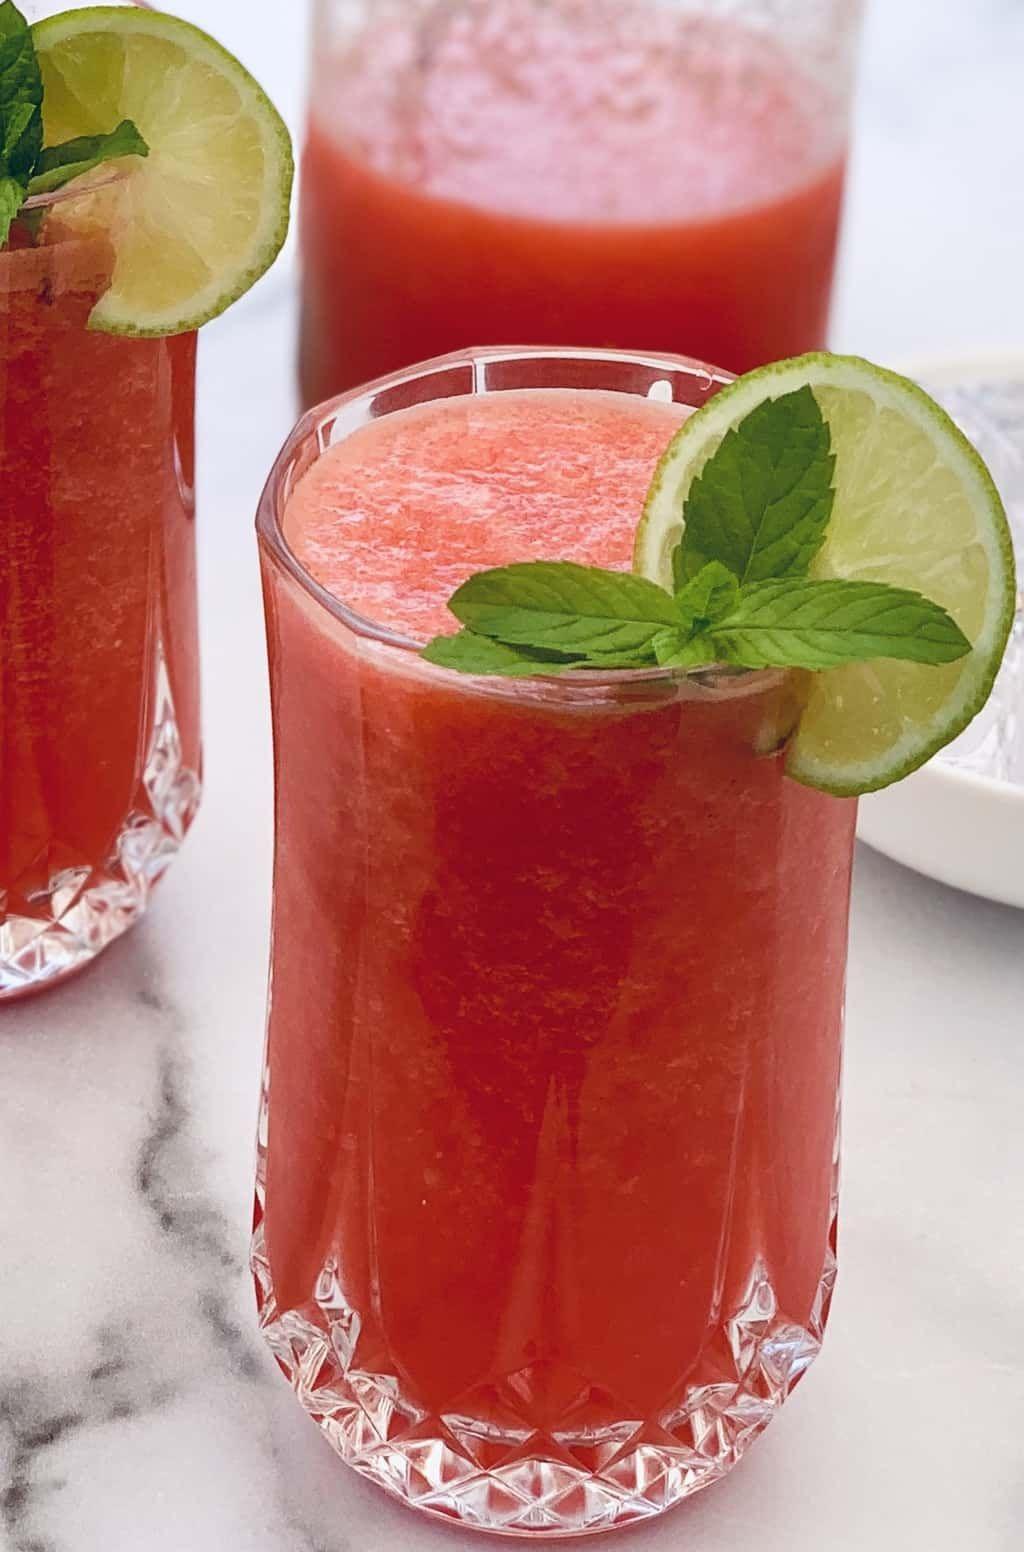 Homemade Watermelon Juice Recipe Watermelon Juice Homemade Drinks Watermelon